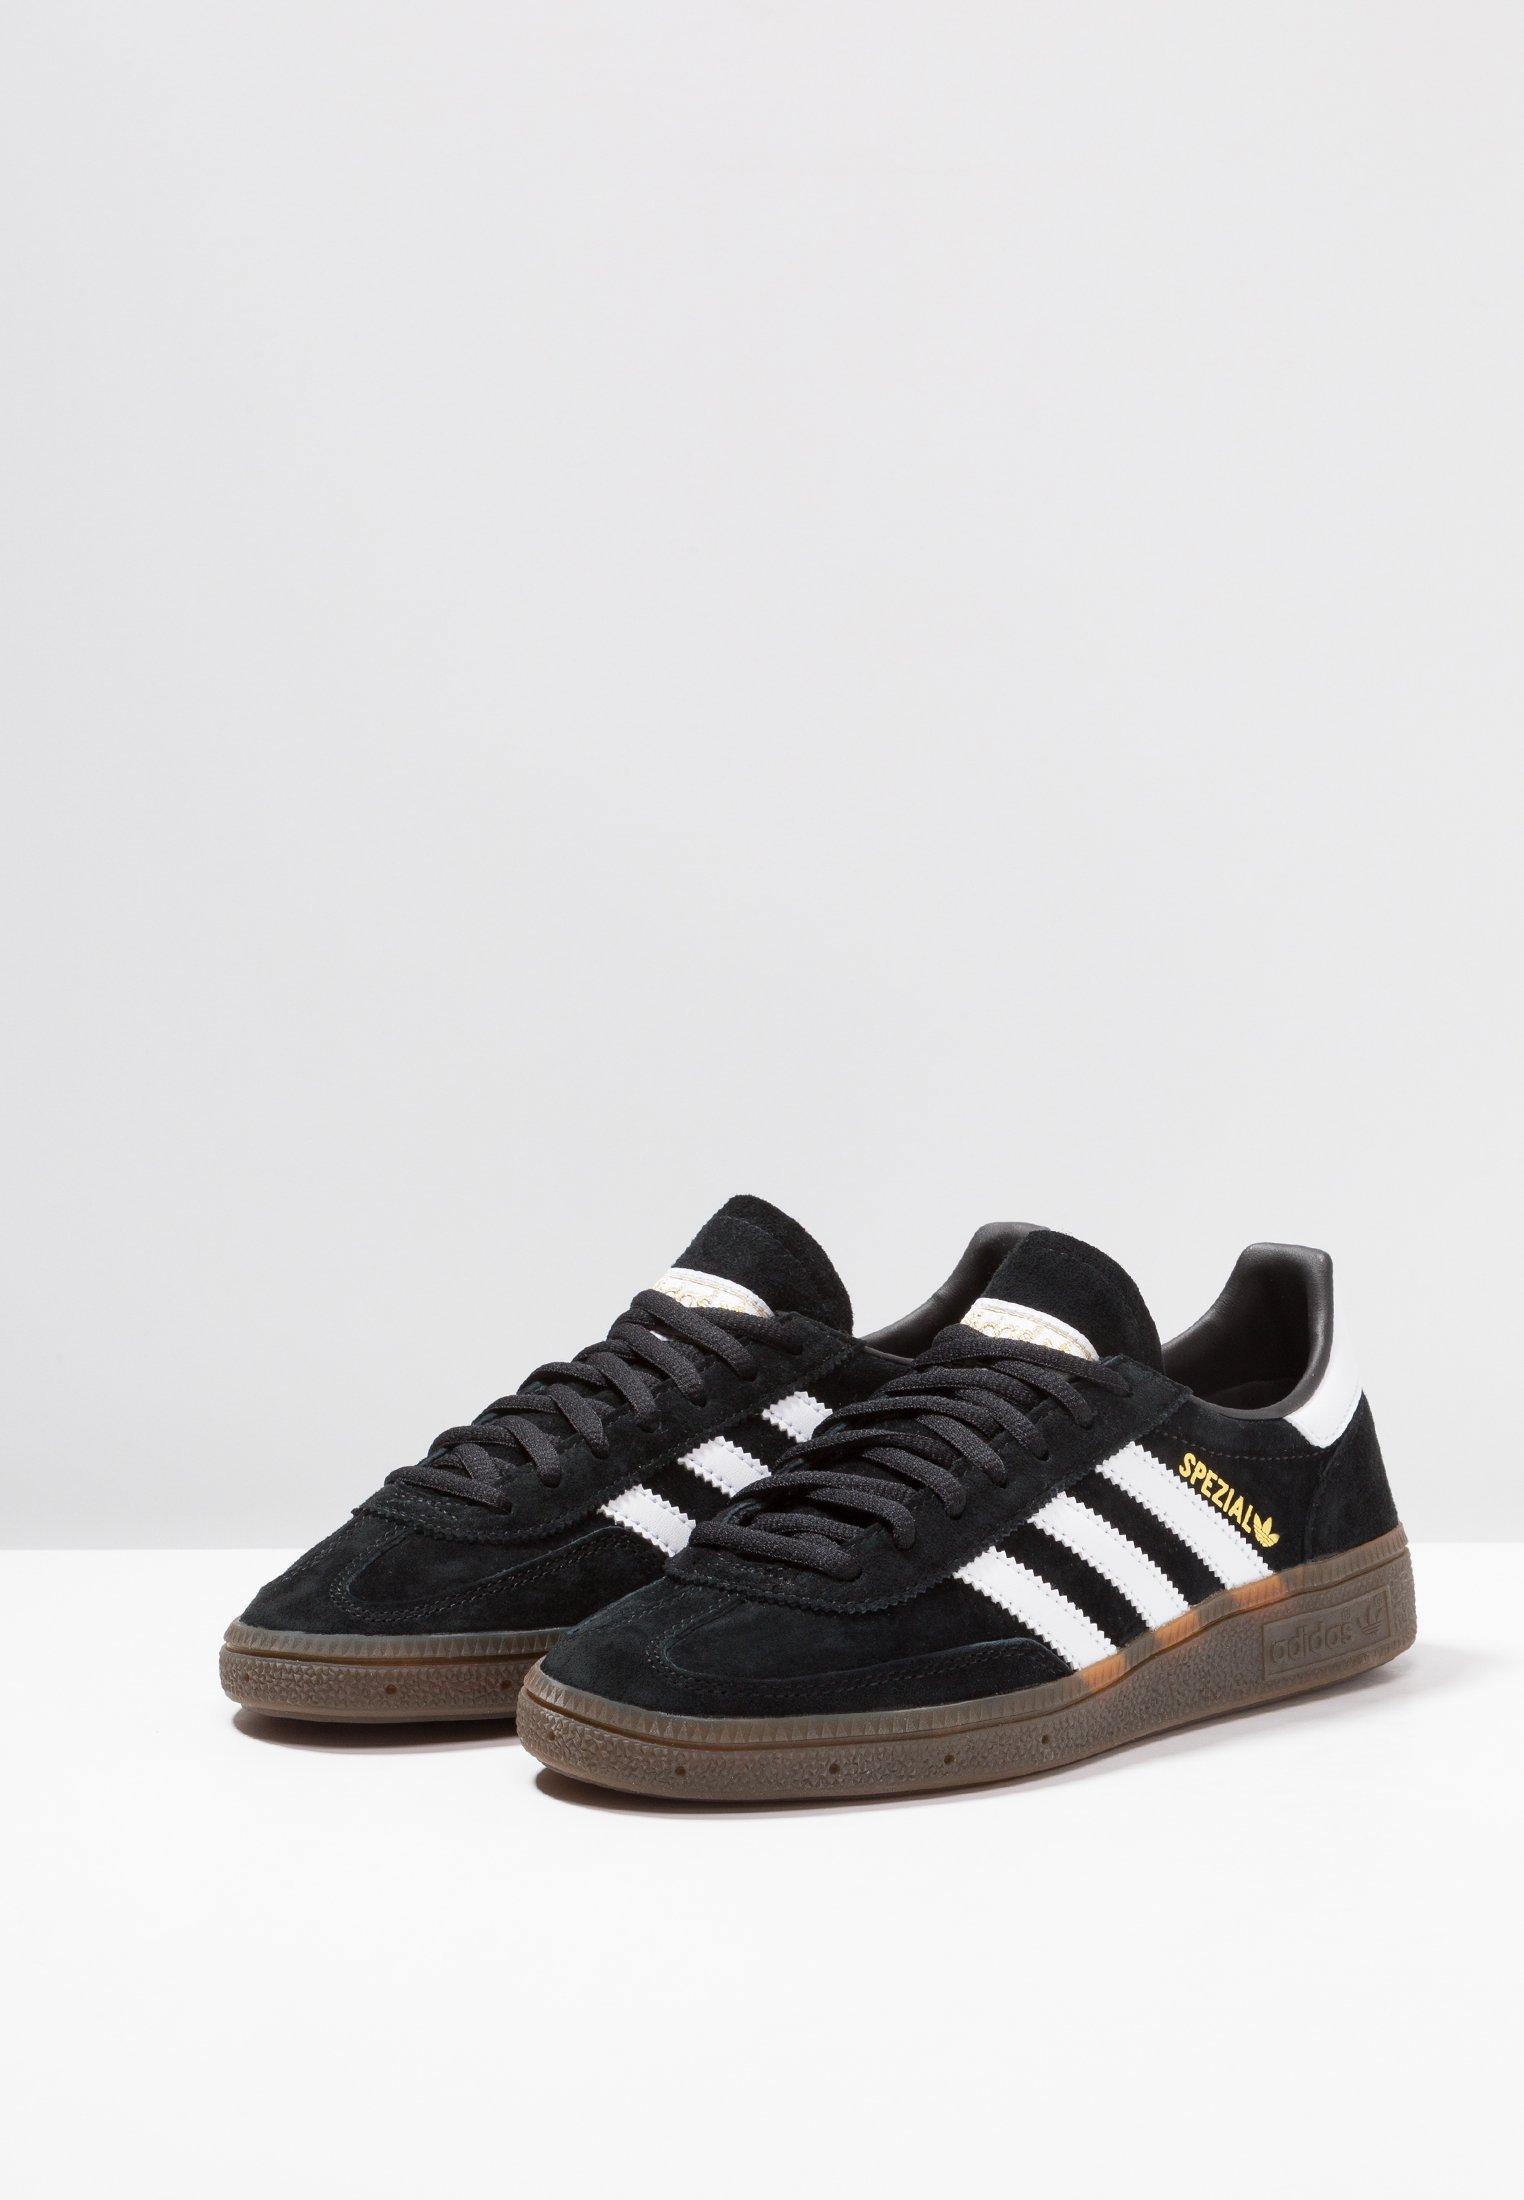 Adidas Originals Handball Spezial - Zapatillas Cblack/ftwwht/gum5